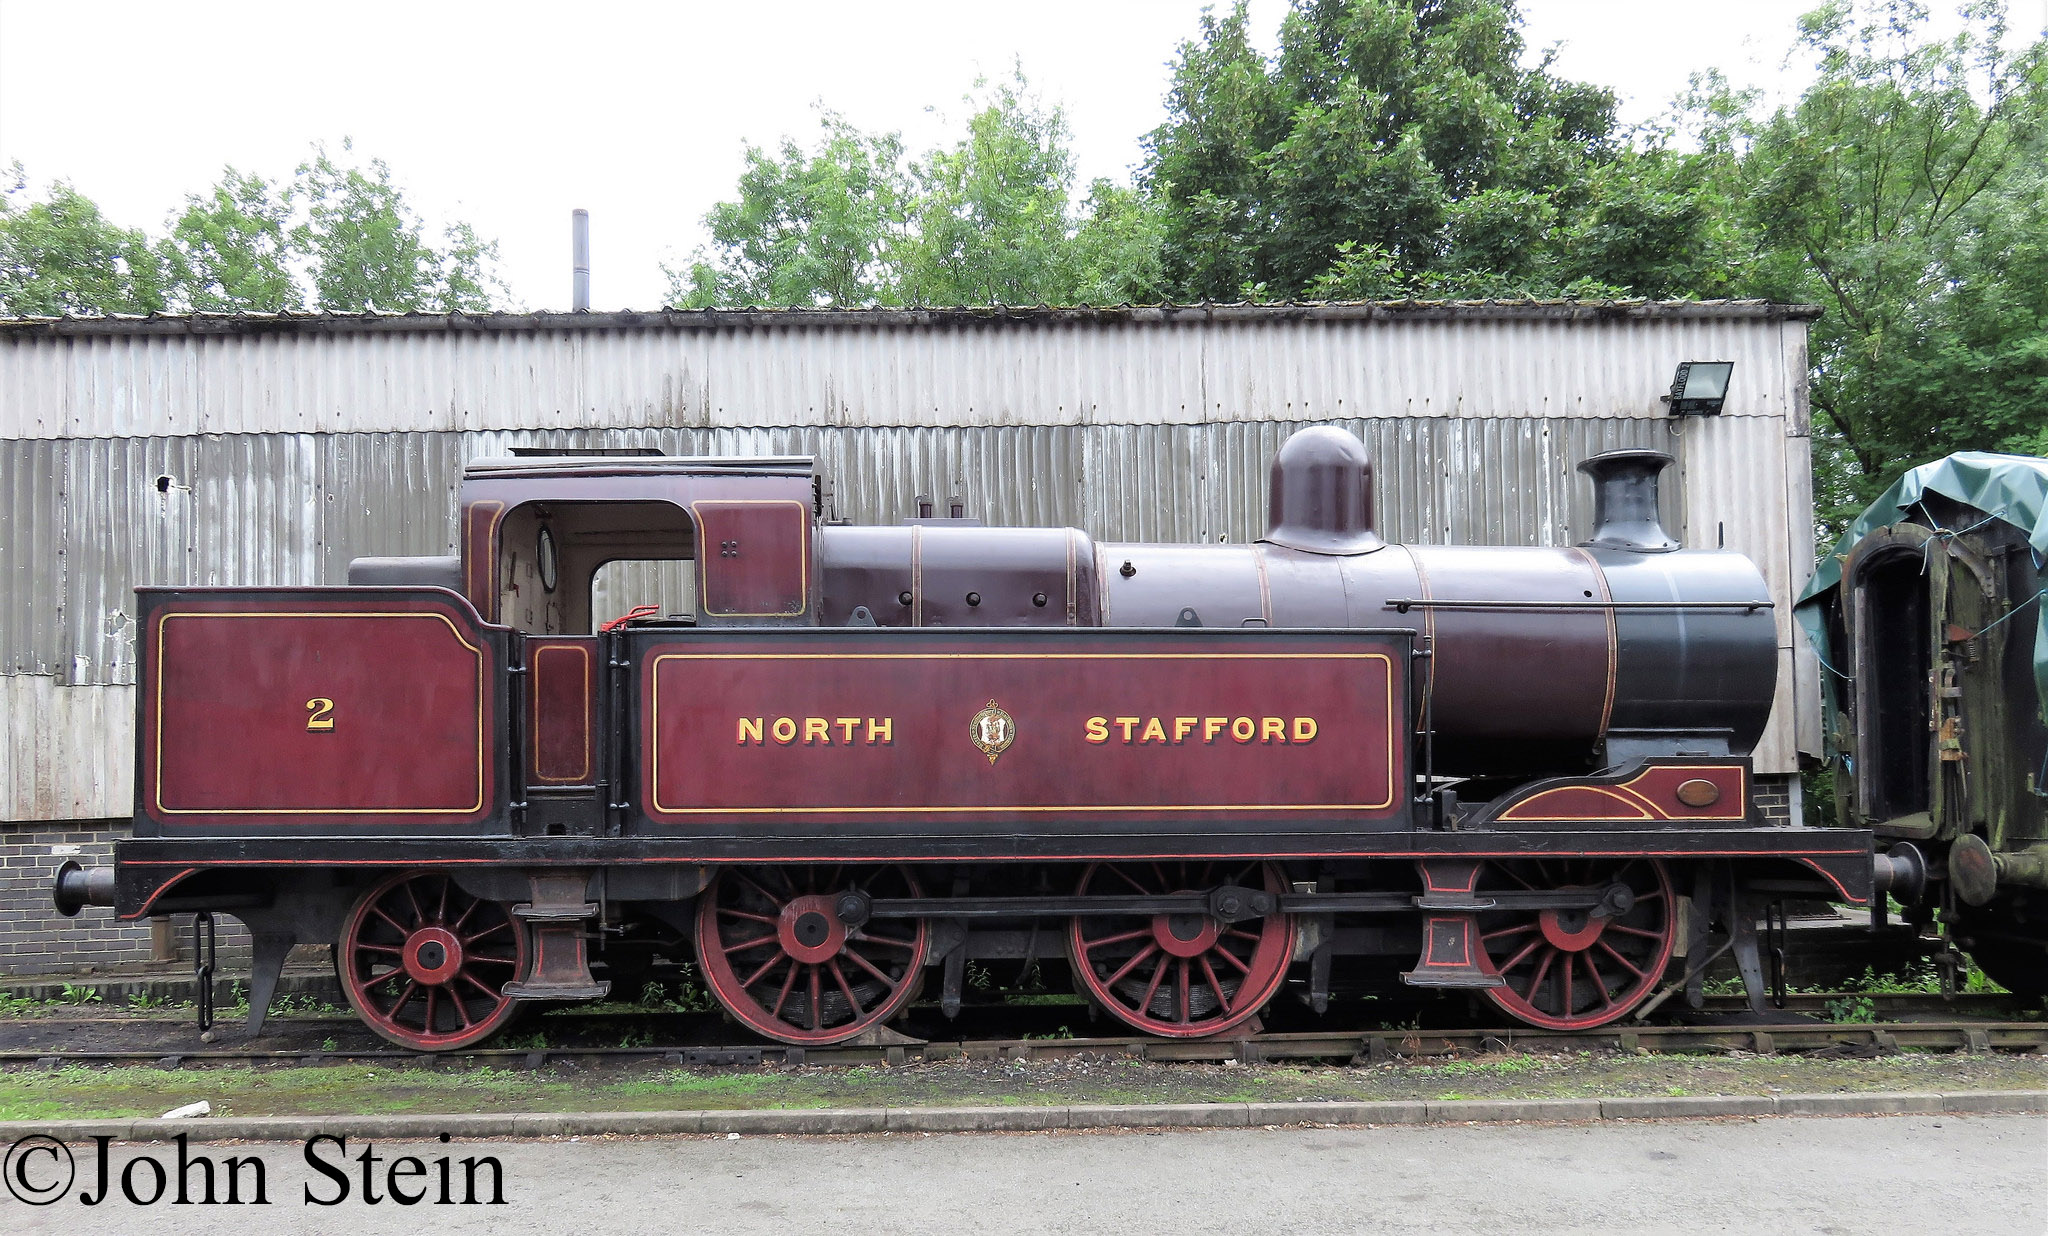 North Staffordshire No 2 at the Foxfield Railway - July 2017.jpg